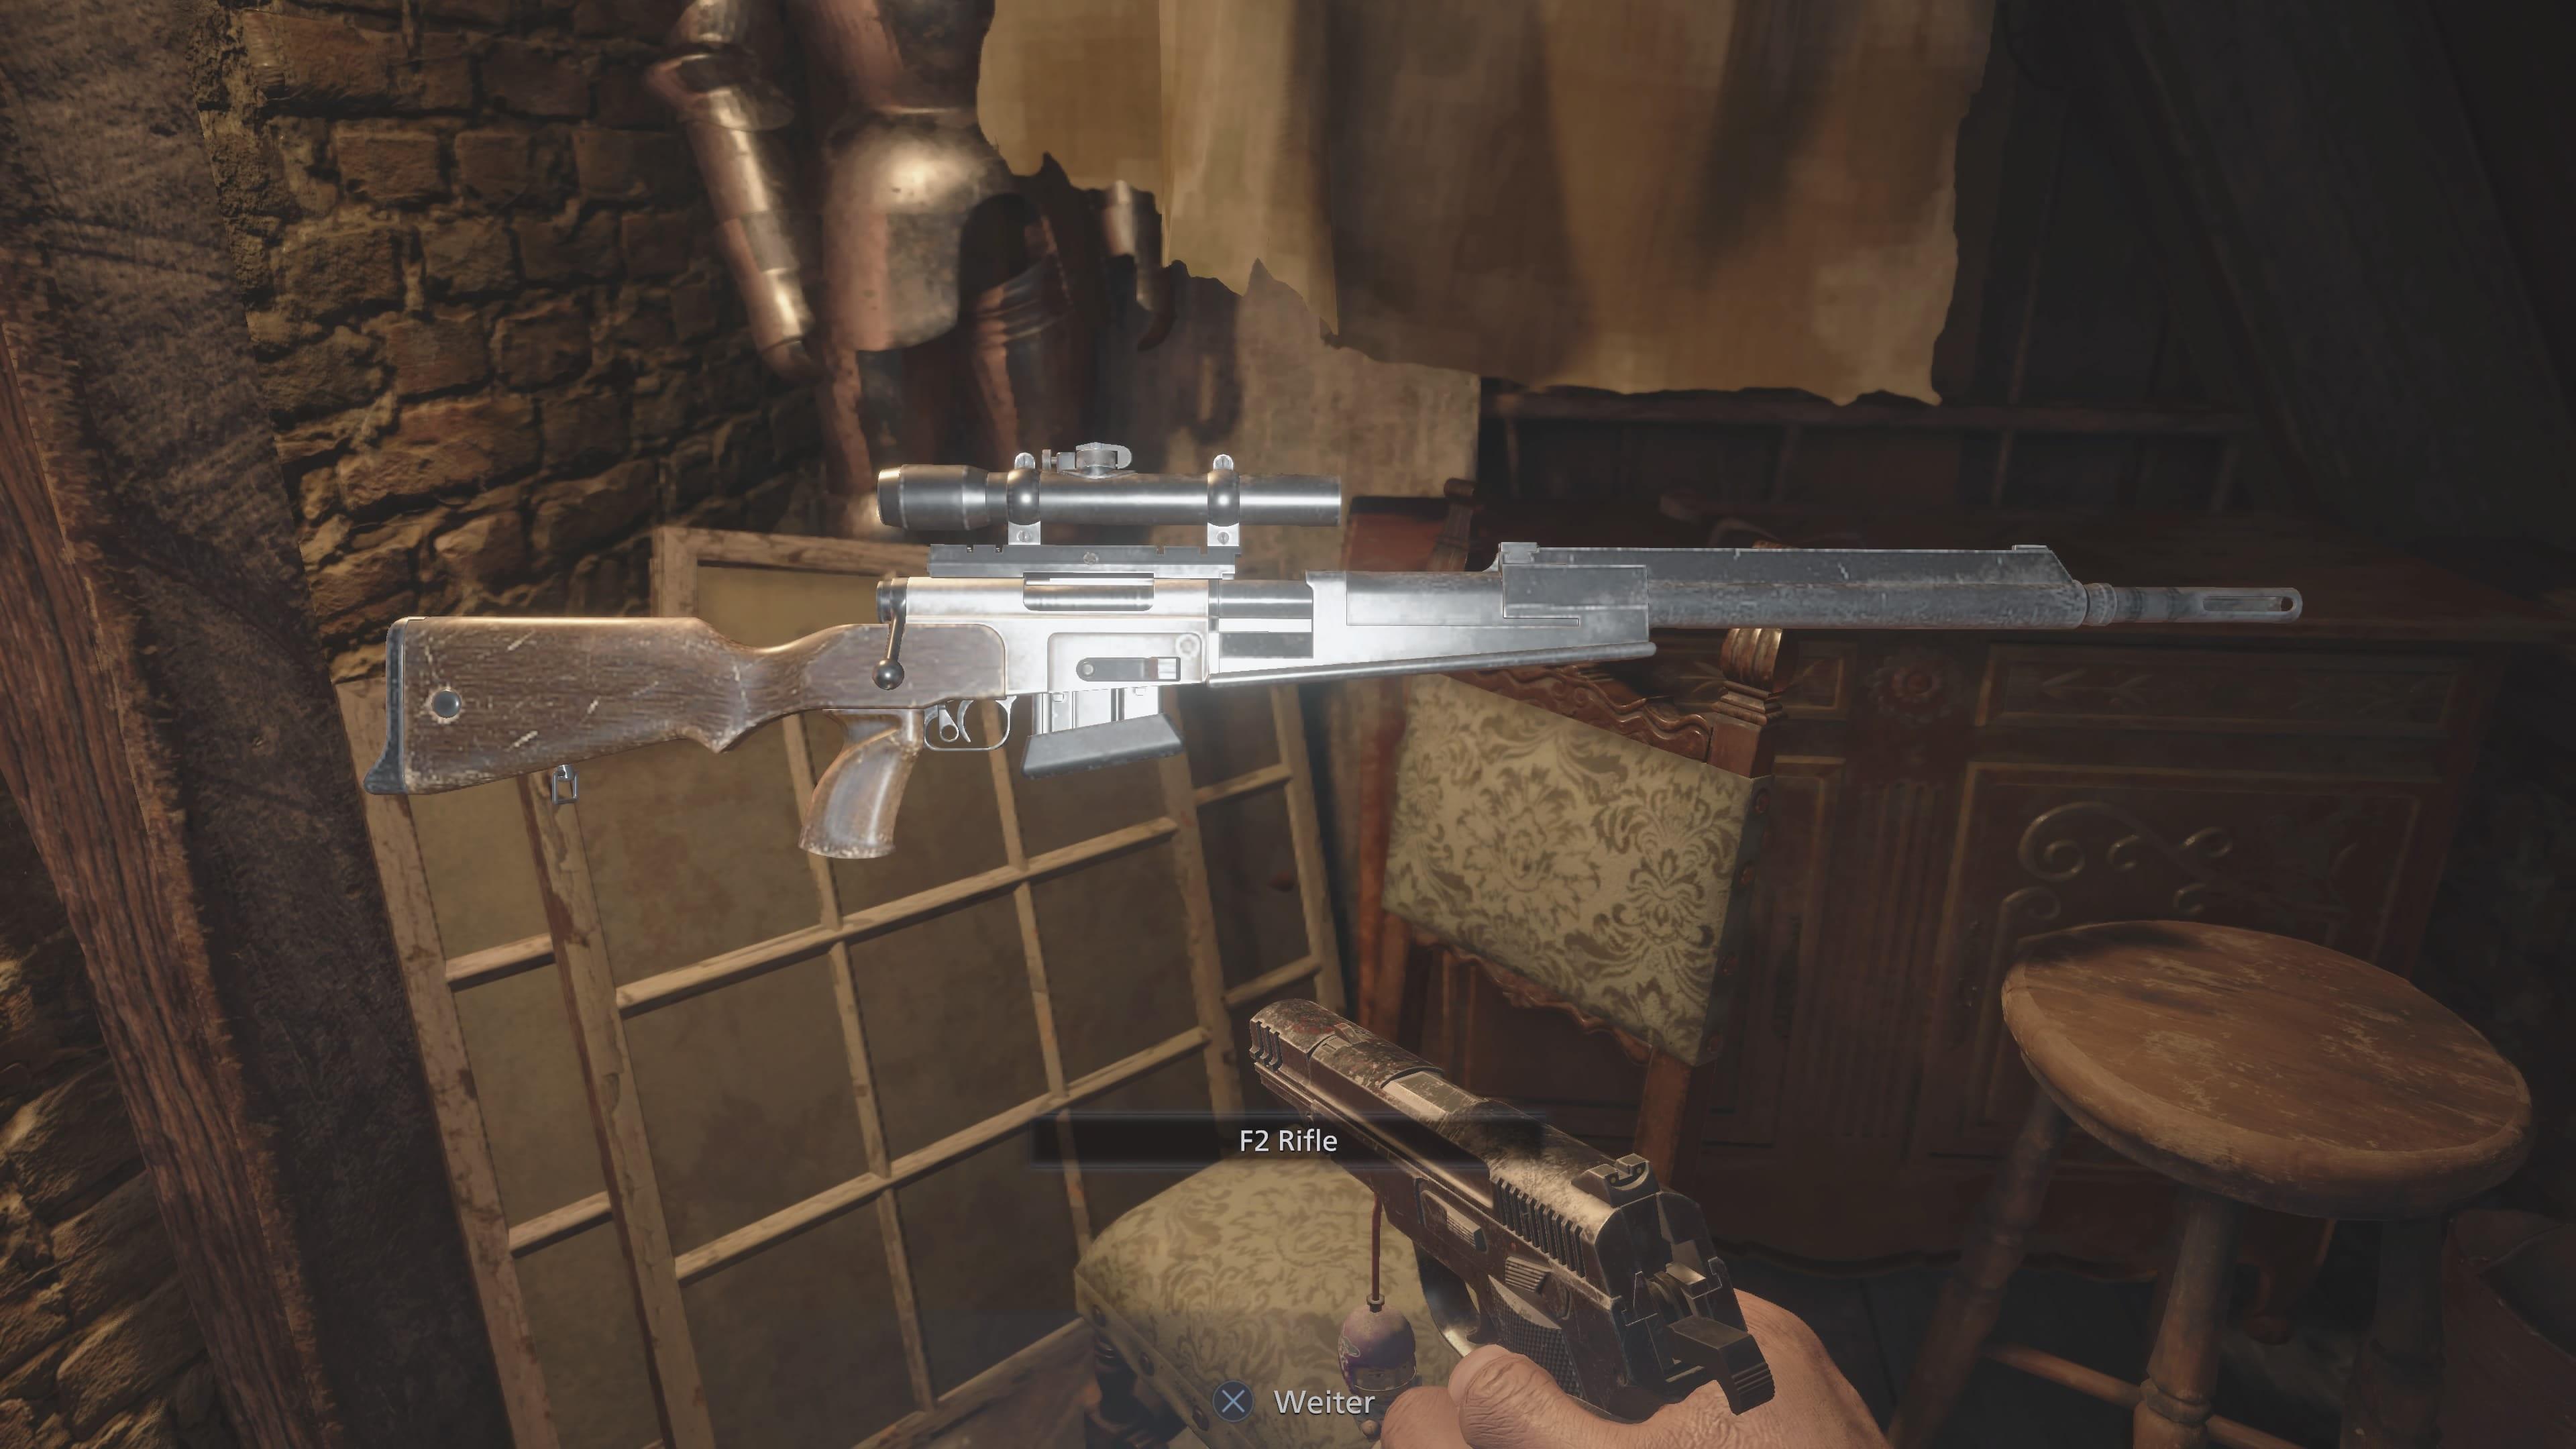 Resident Evil 8: Emplacement du fusil F2 (solution)